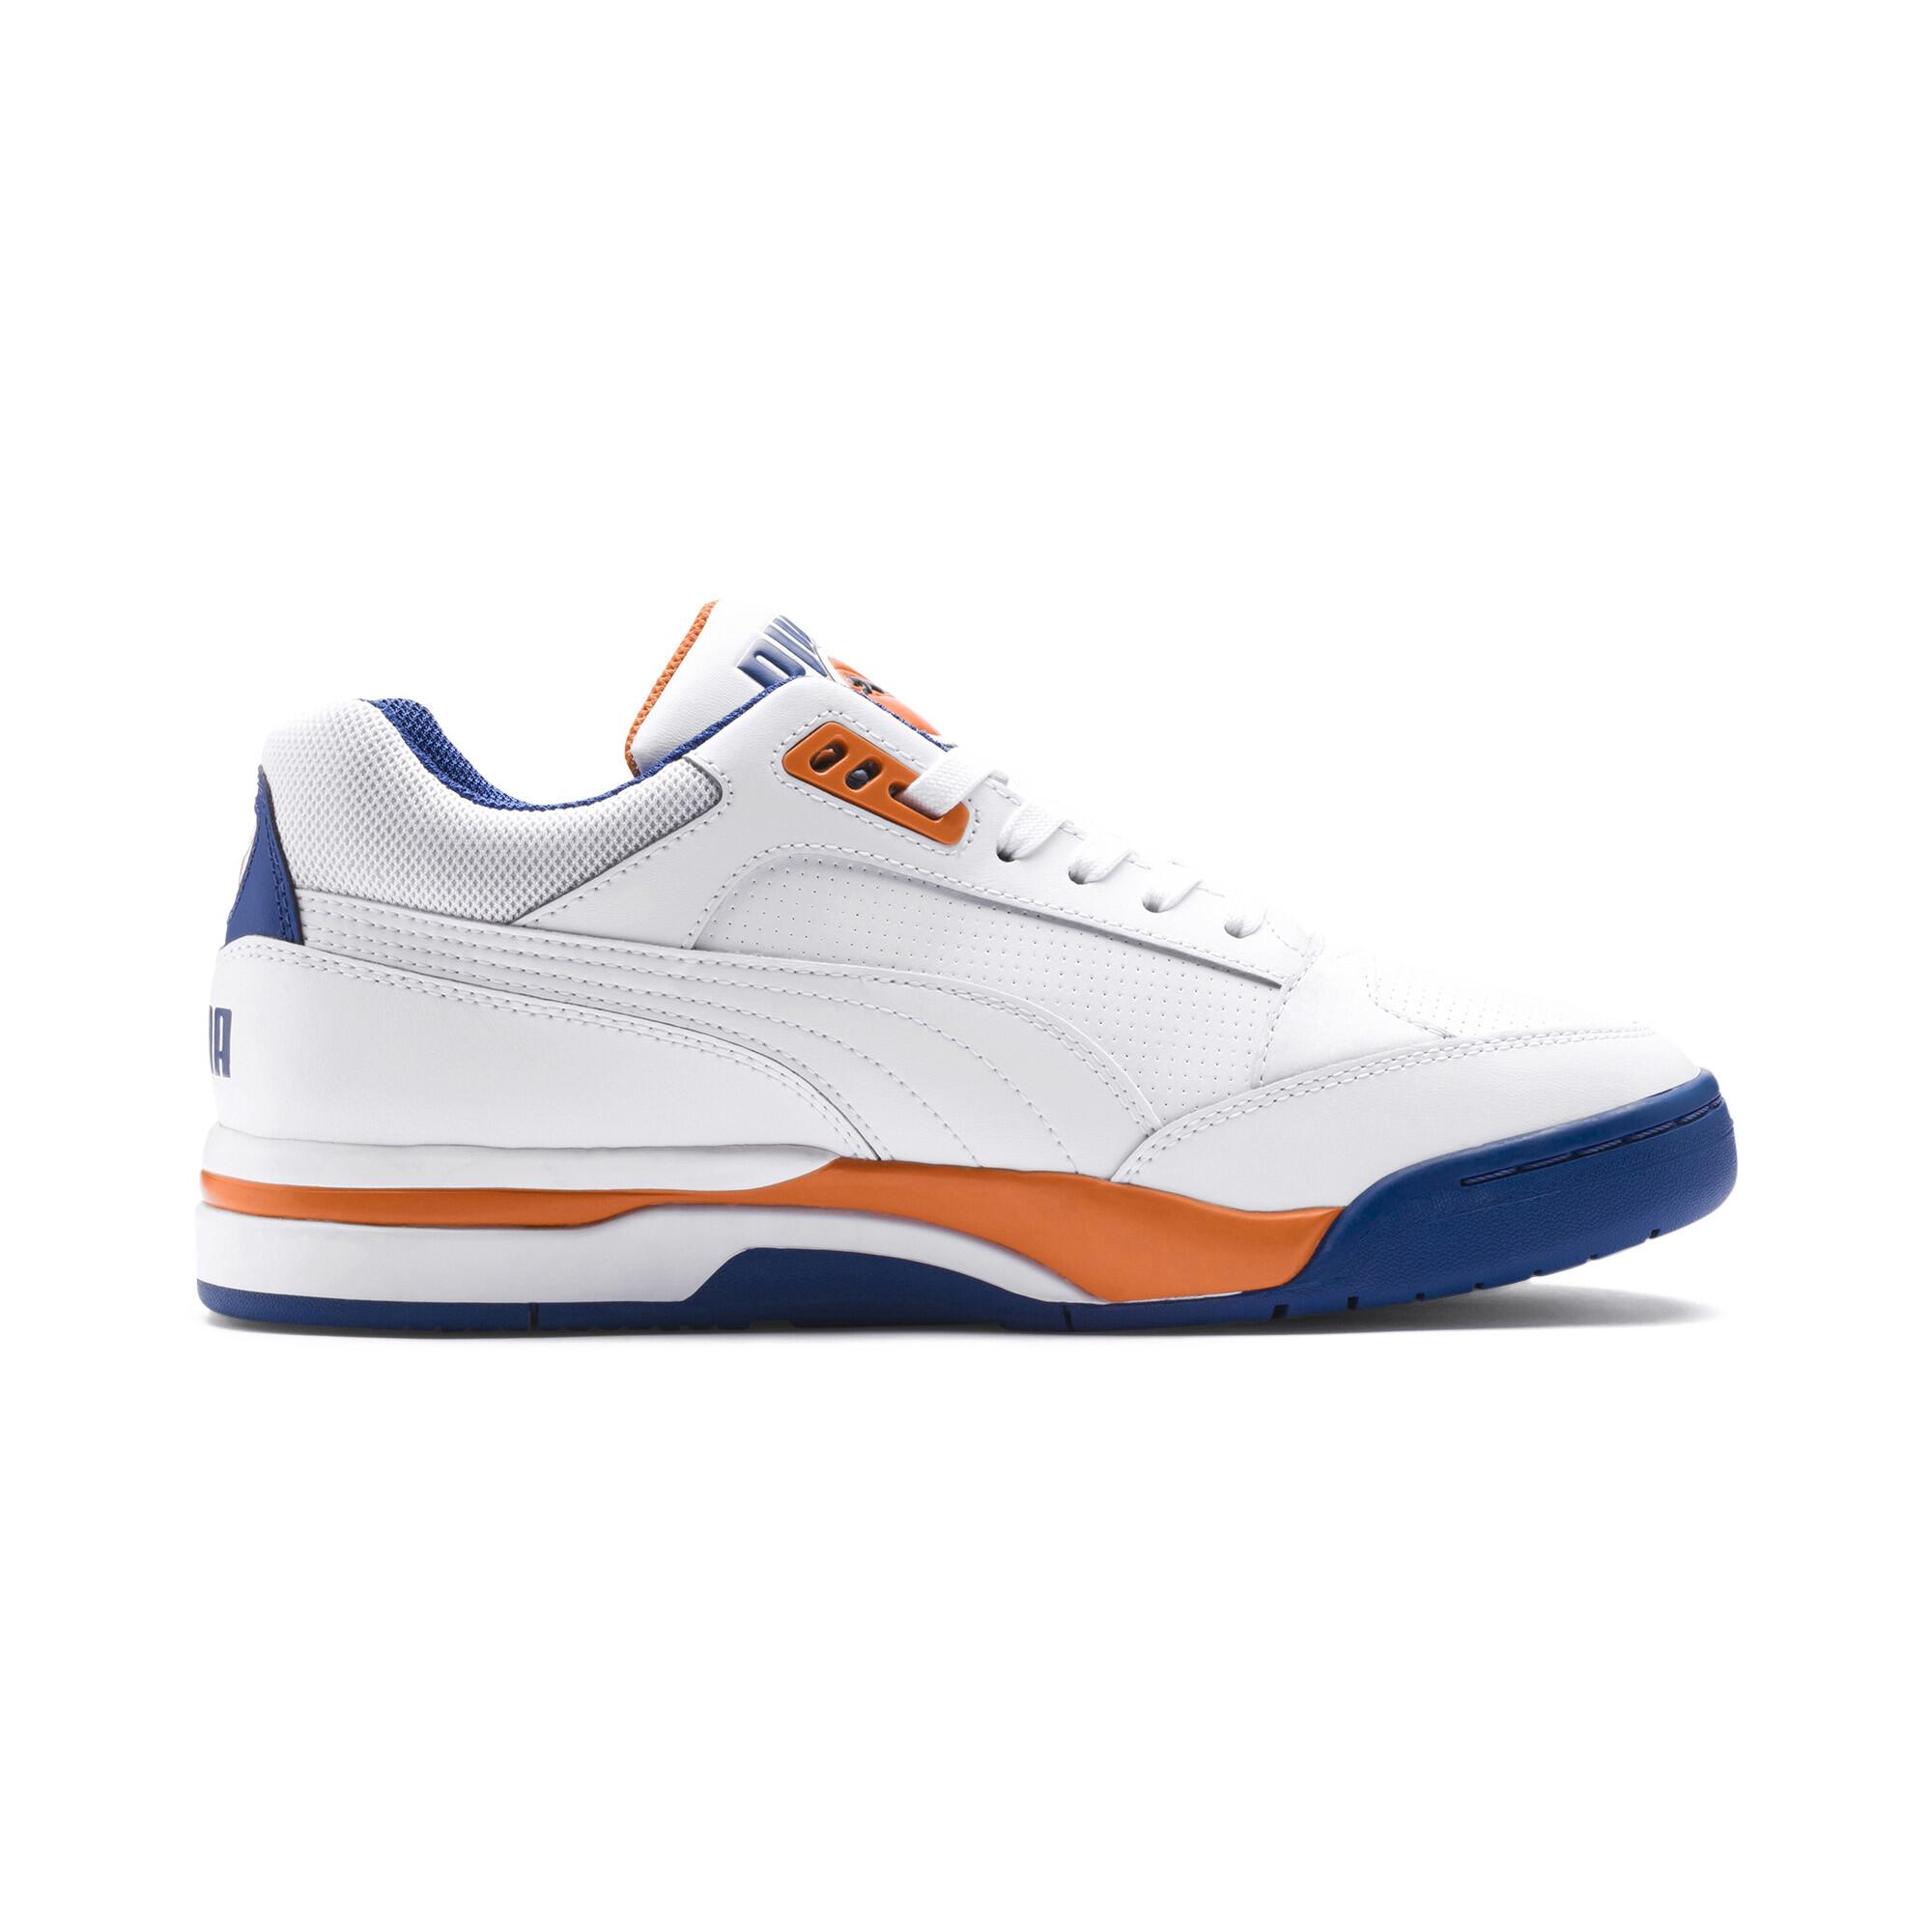 Indexbild 33 - PUMA Palace Guard Sneaker Unisex Schuhe Sport Classics Neu